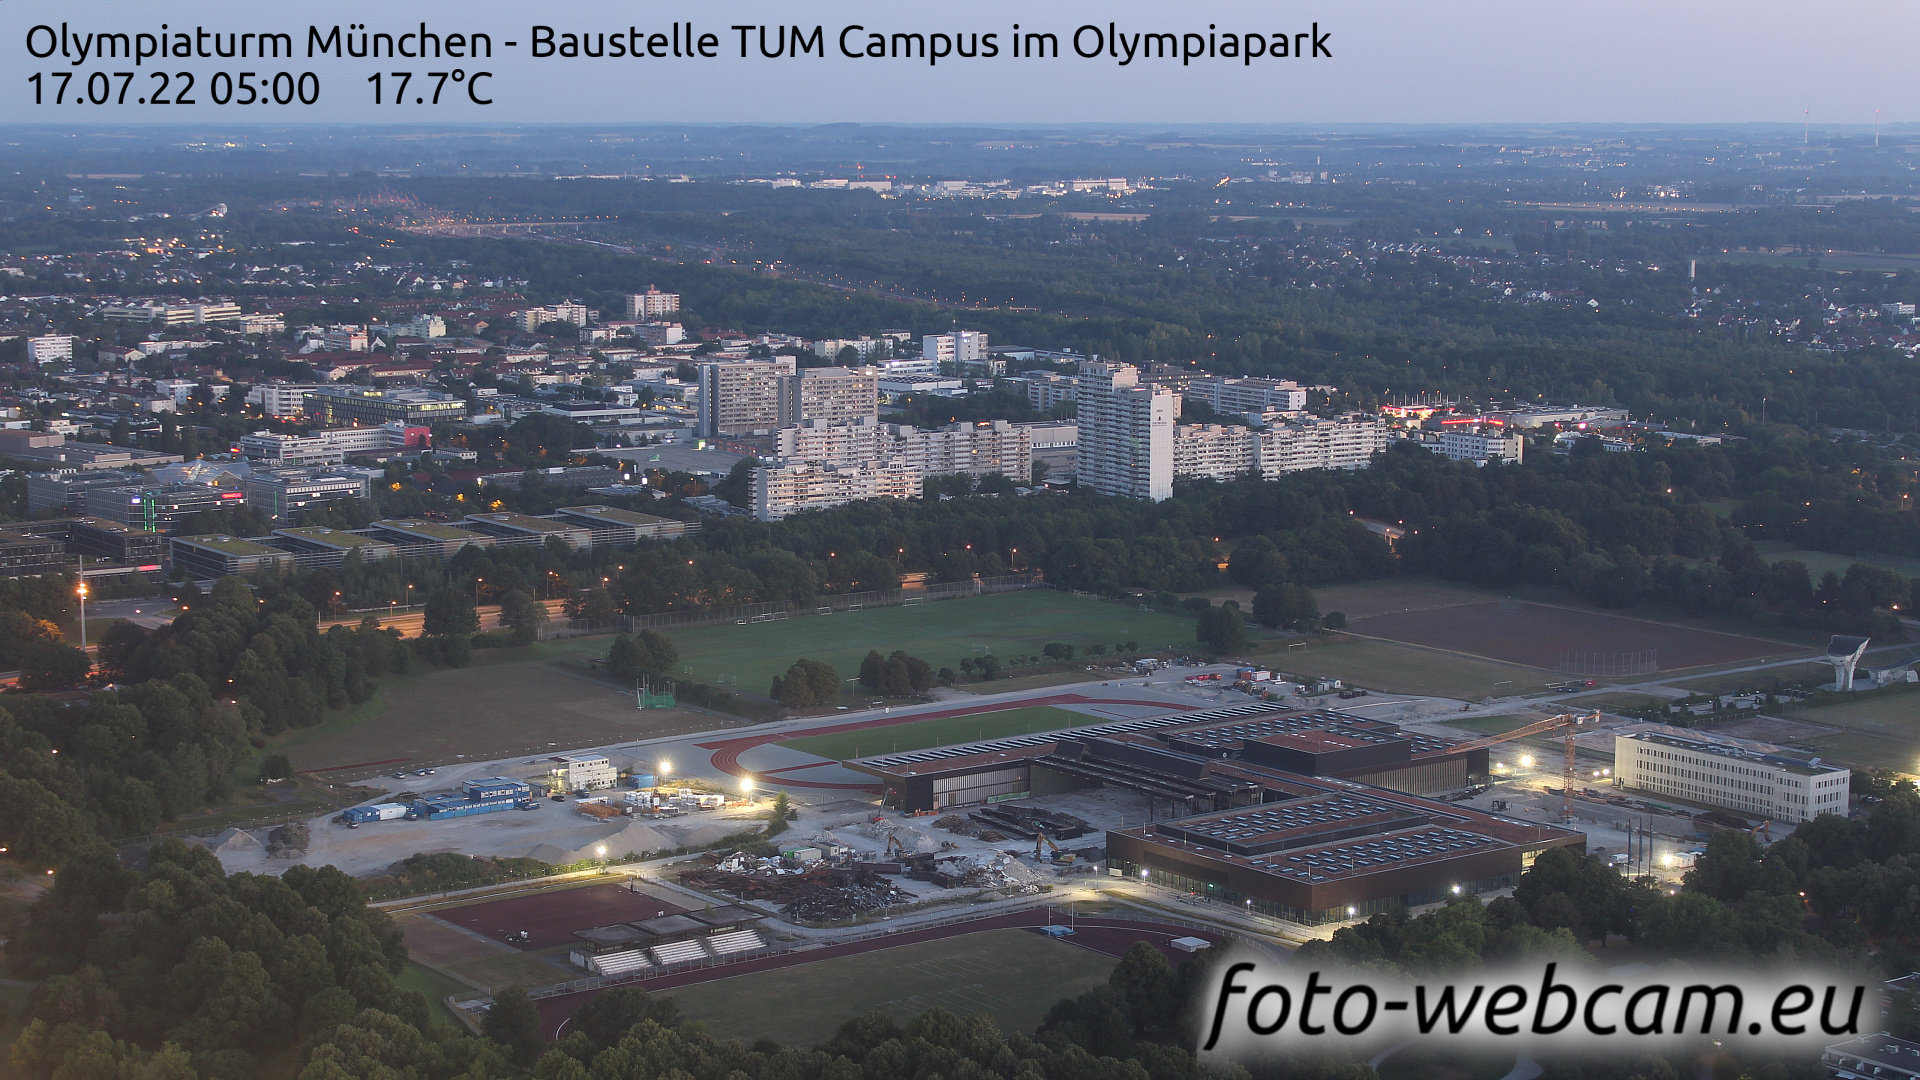 Munich Tue. 05:30